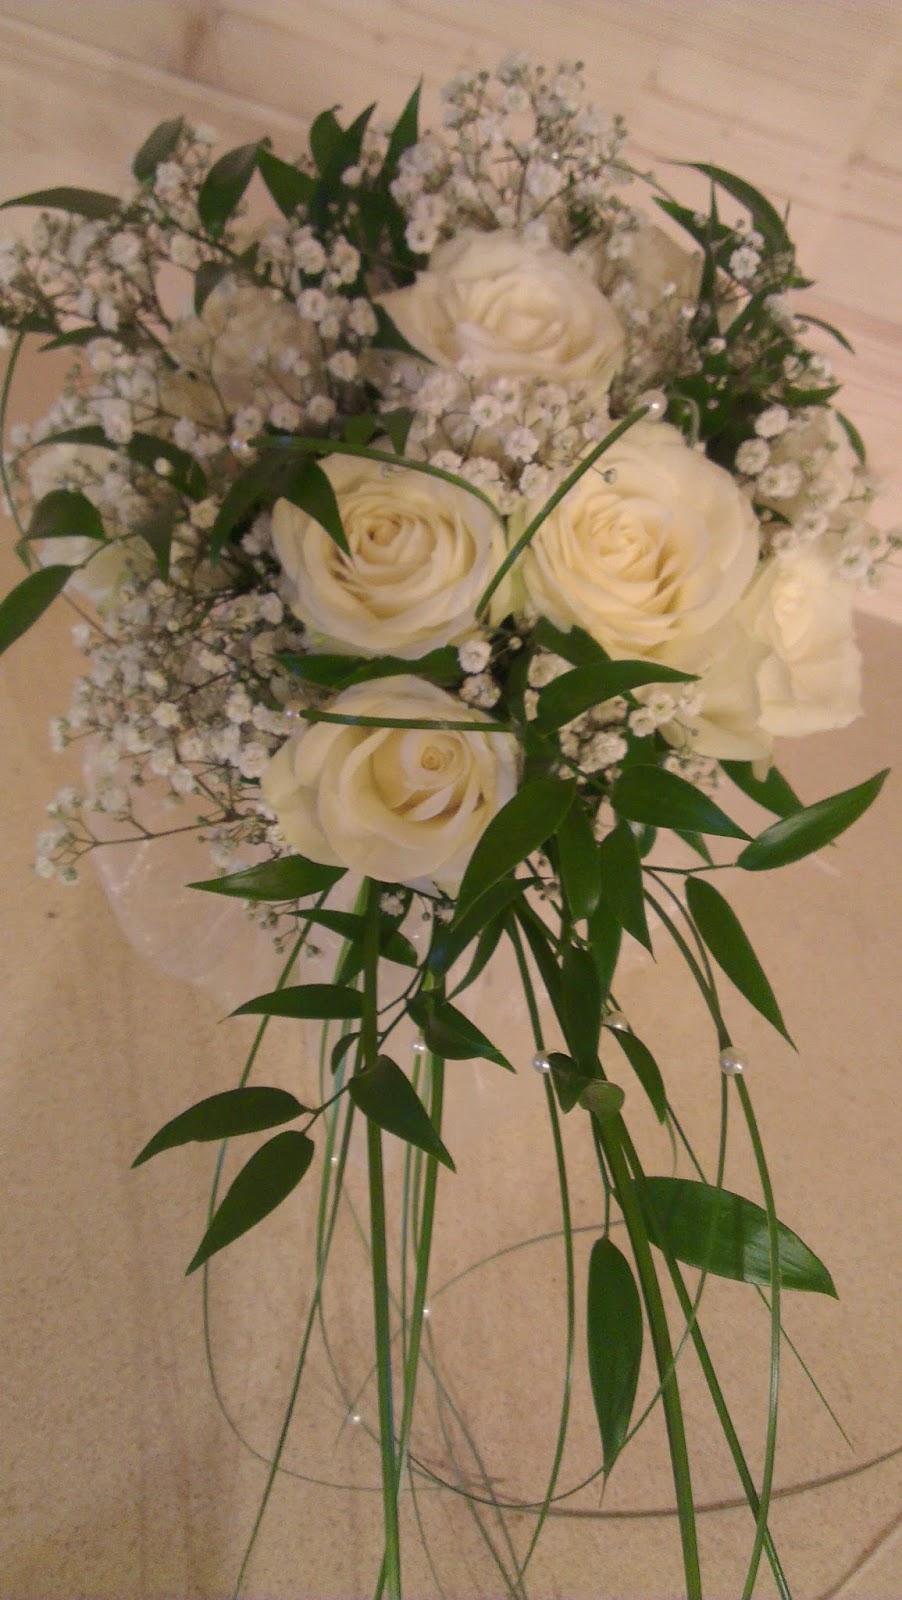 Bear Grass /& Diamante Posy Posie Wedding Flowers Gyp Handtied Bouquet Rose